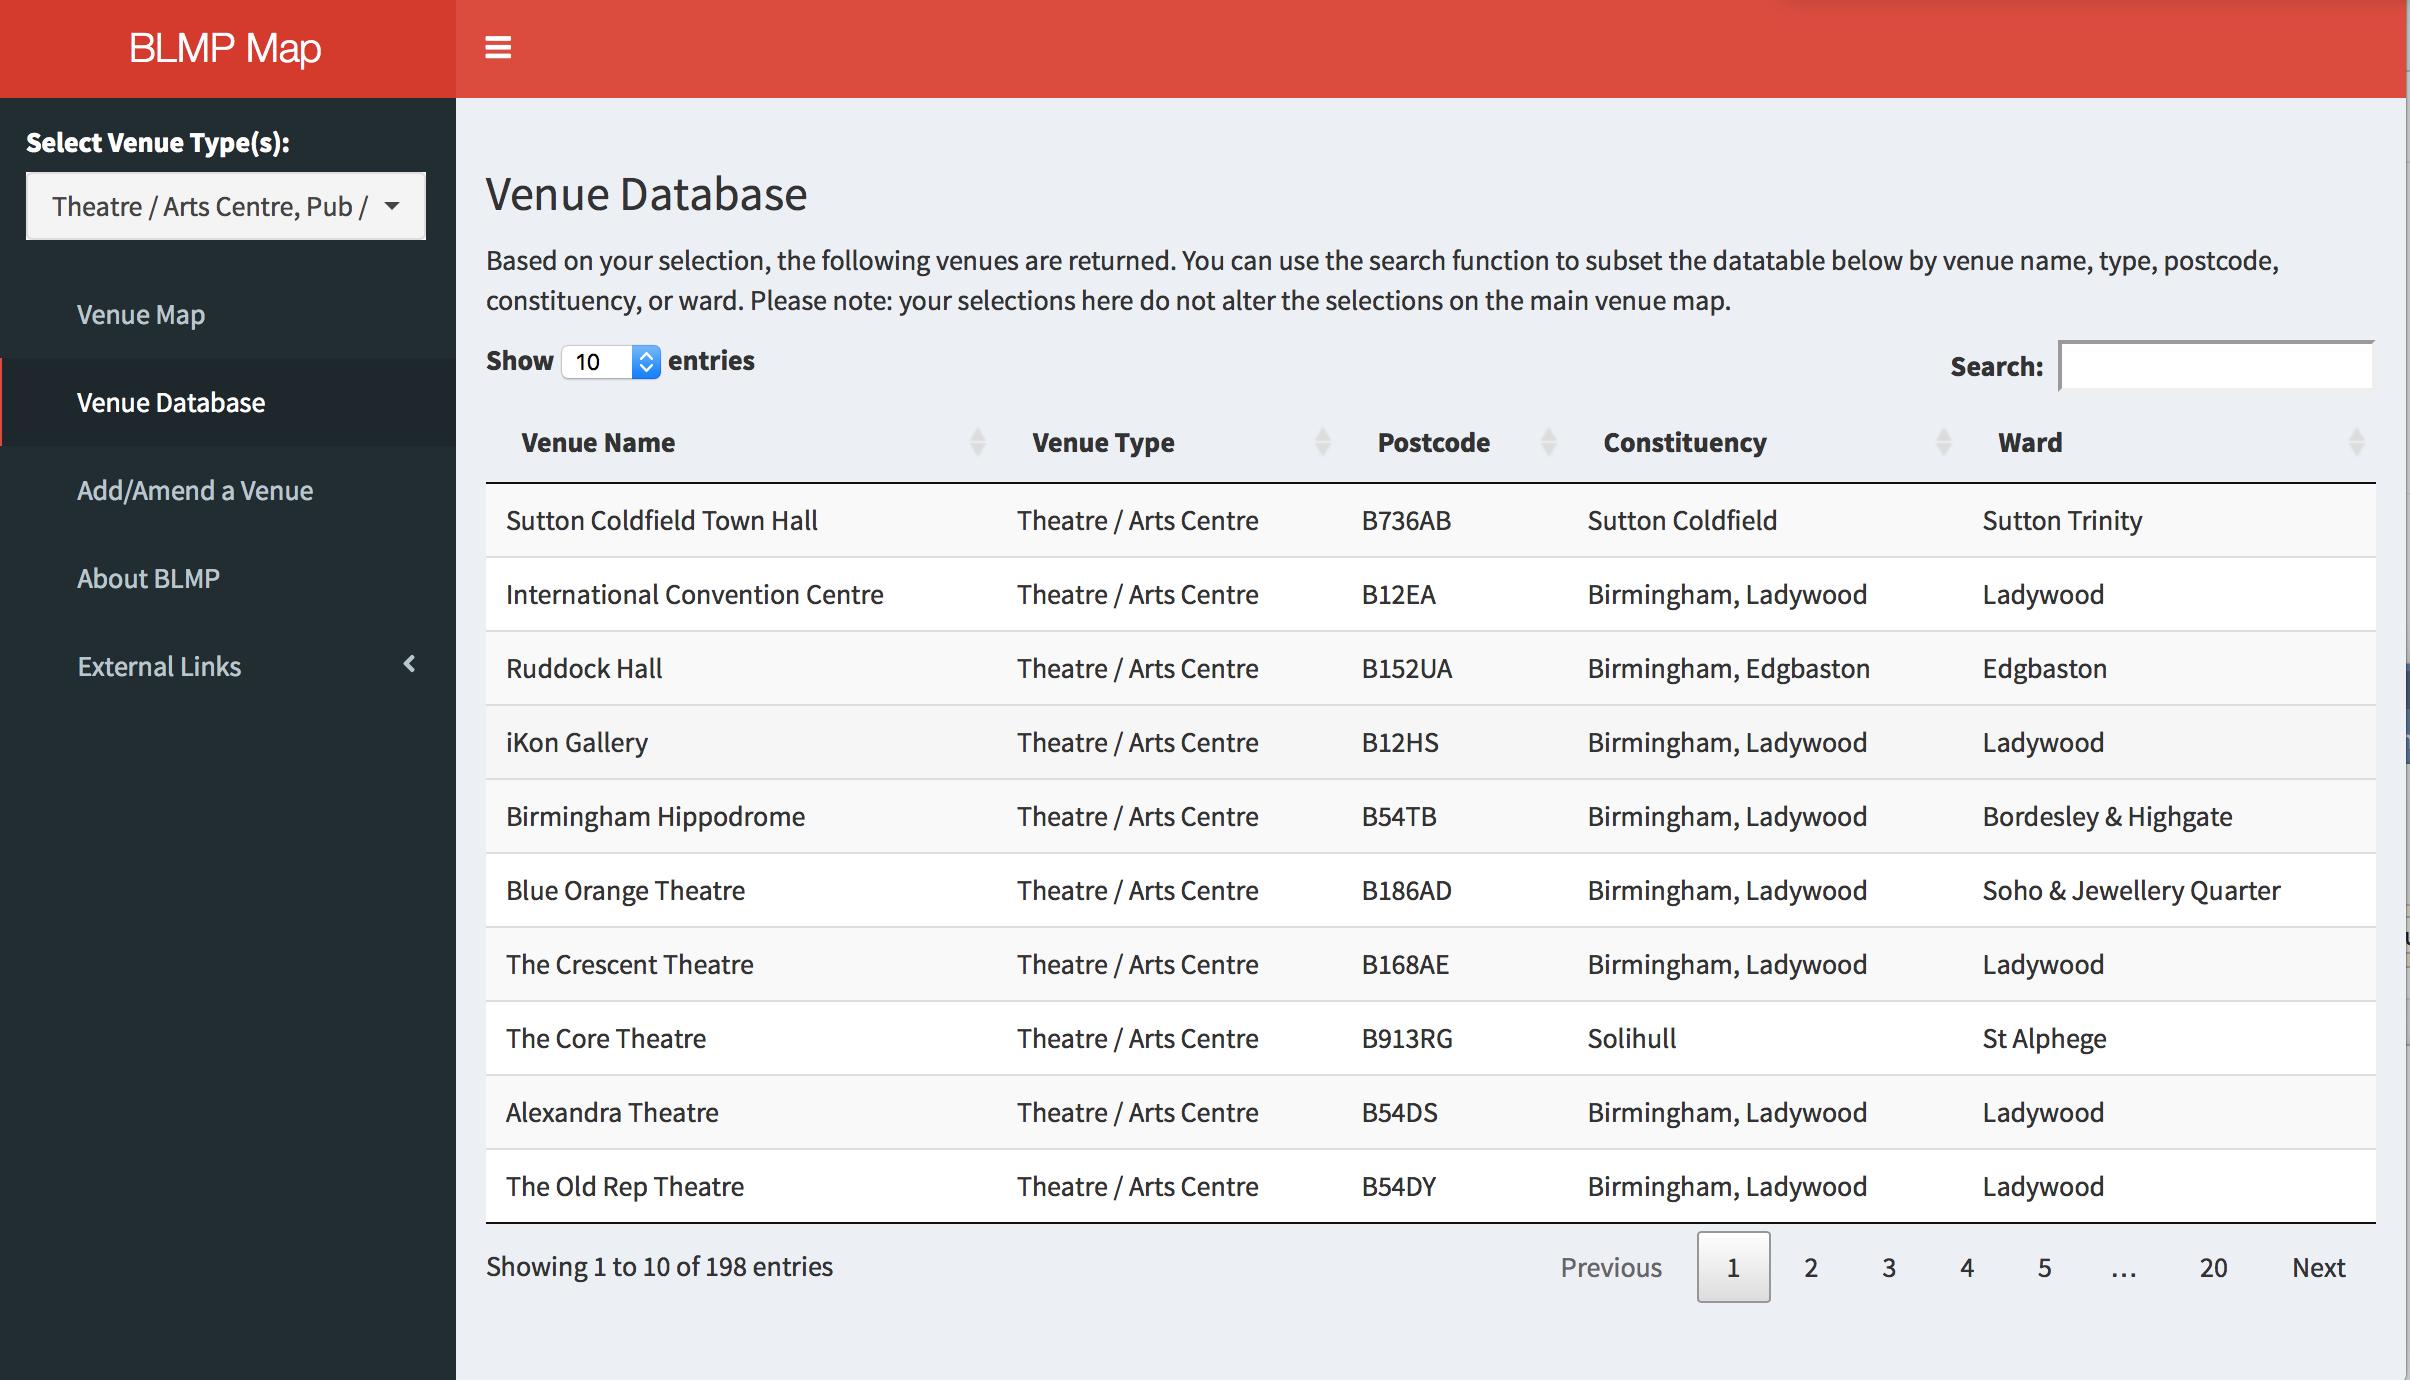 Venue Database image (BLMP post)